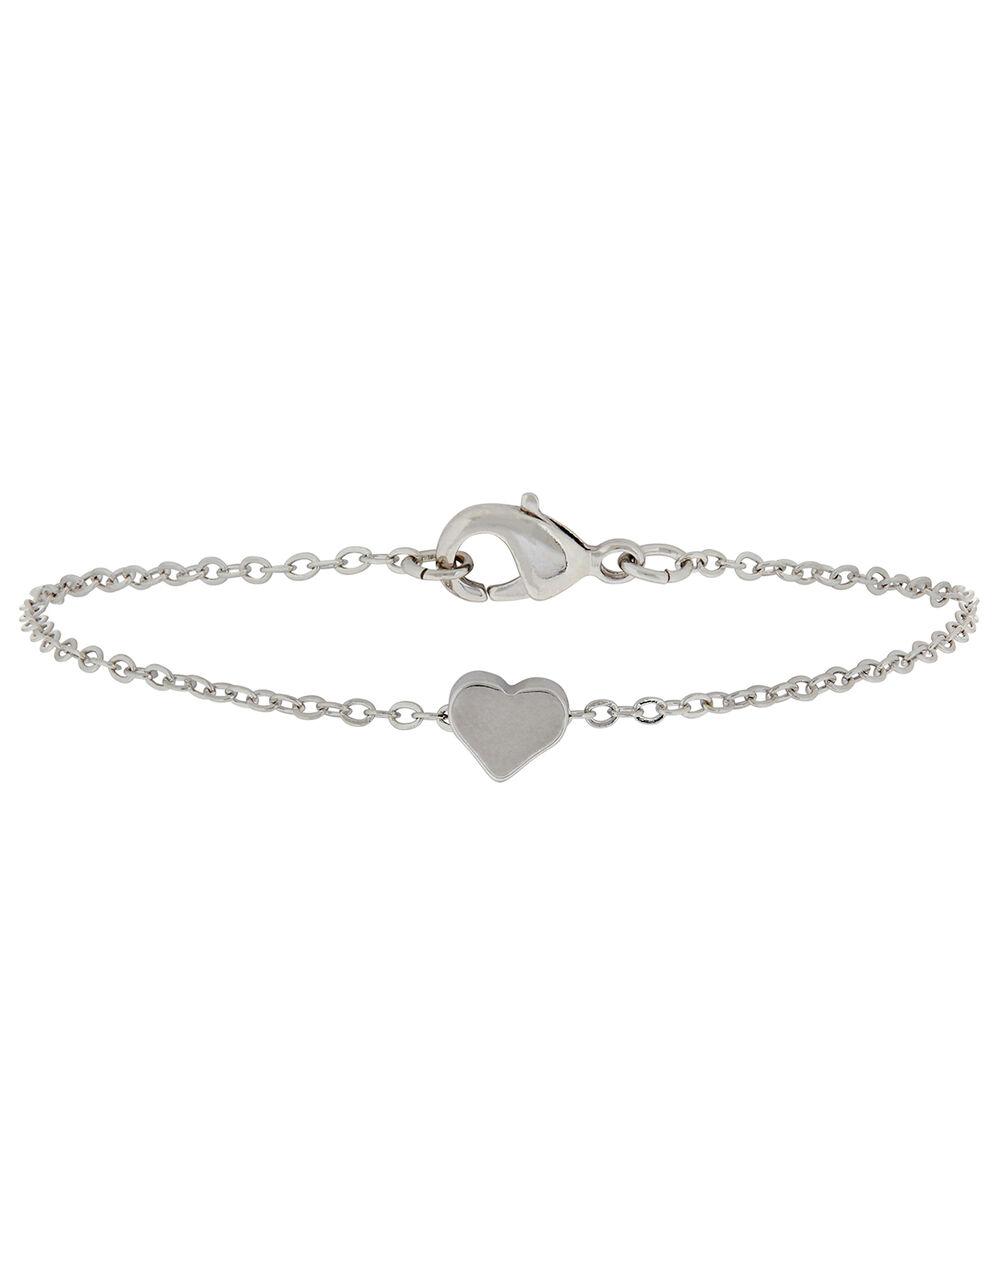 Heart Charm Bracelet, , large